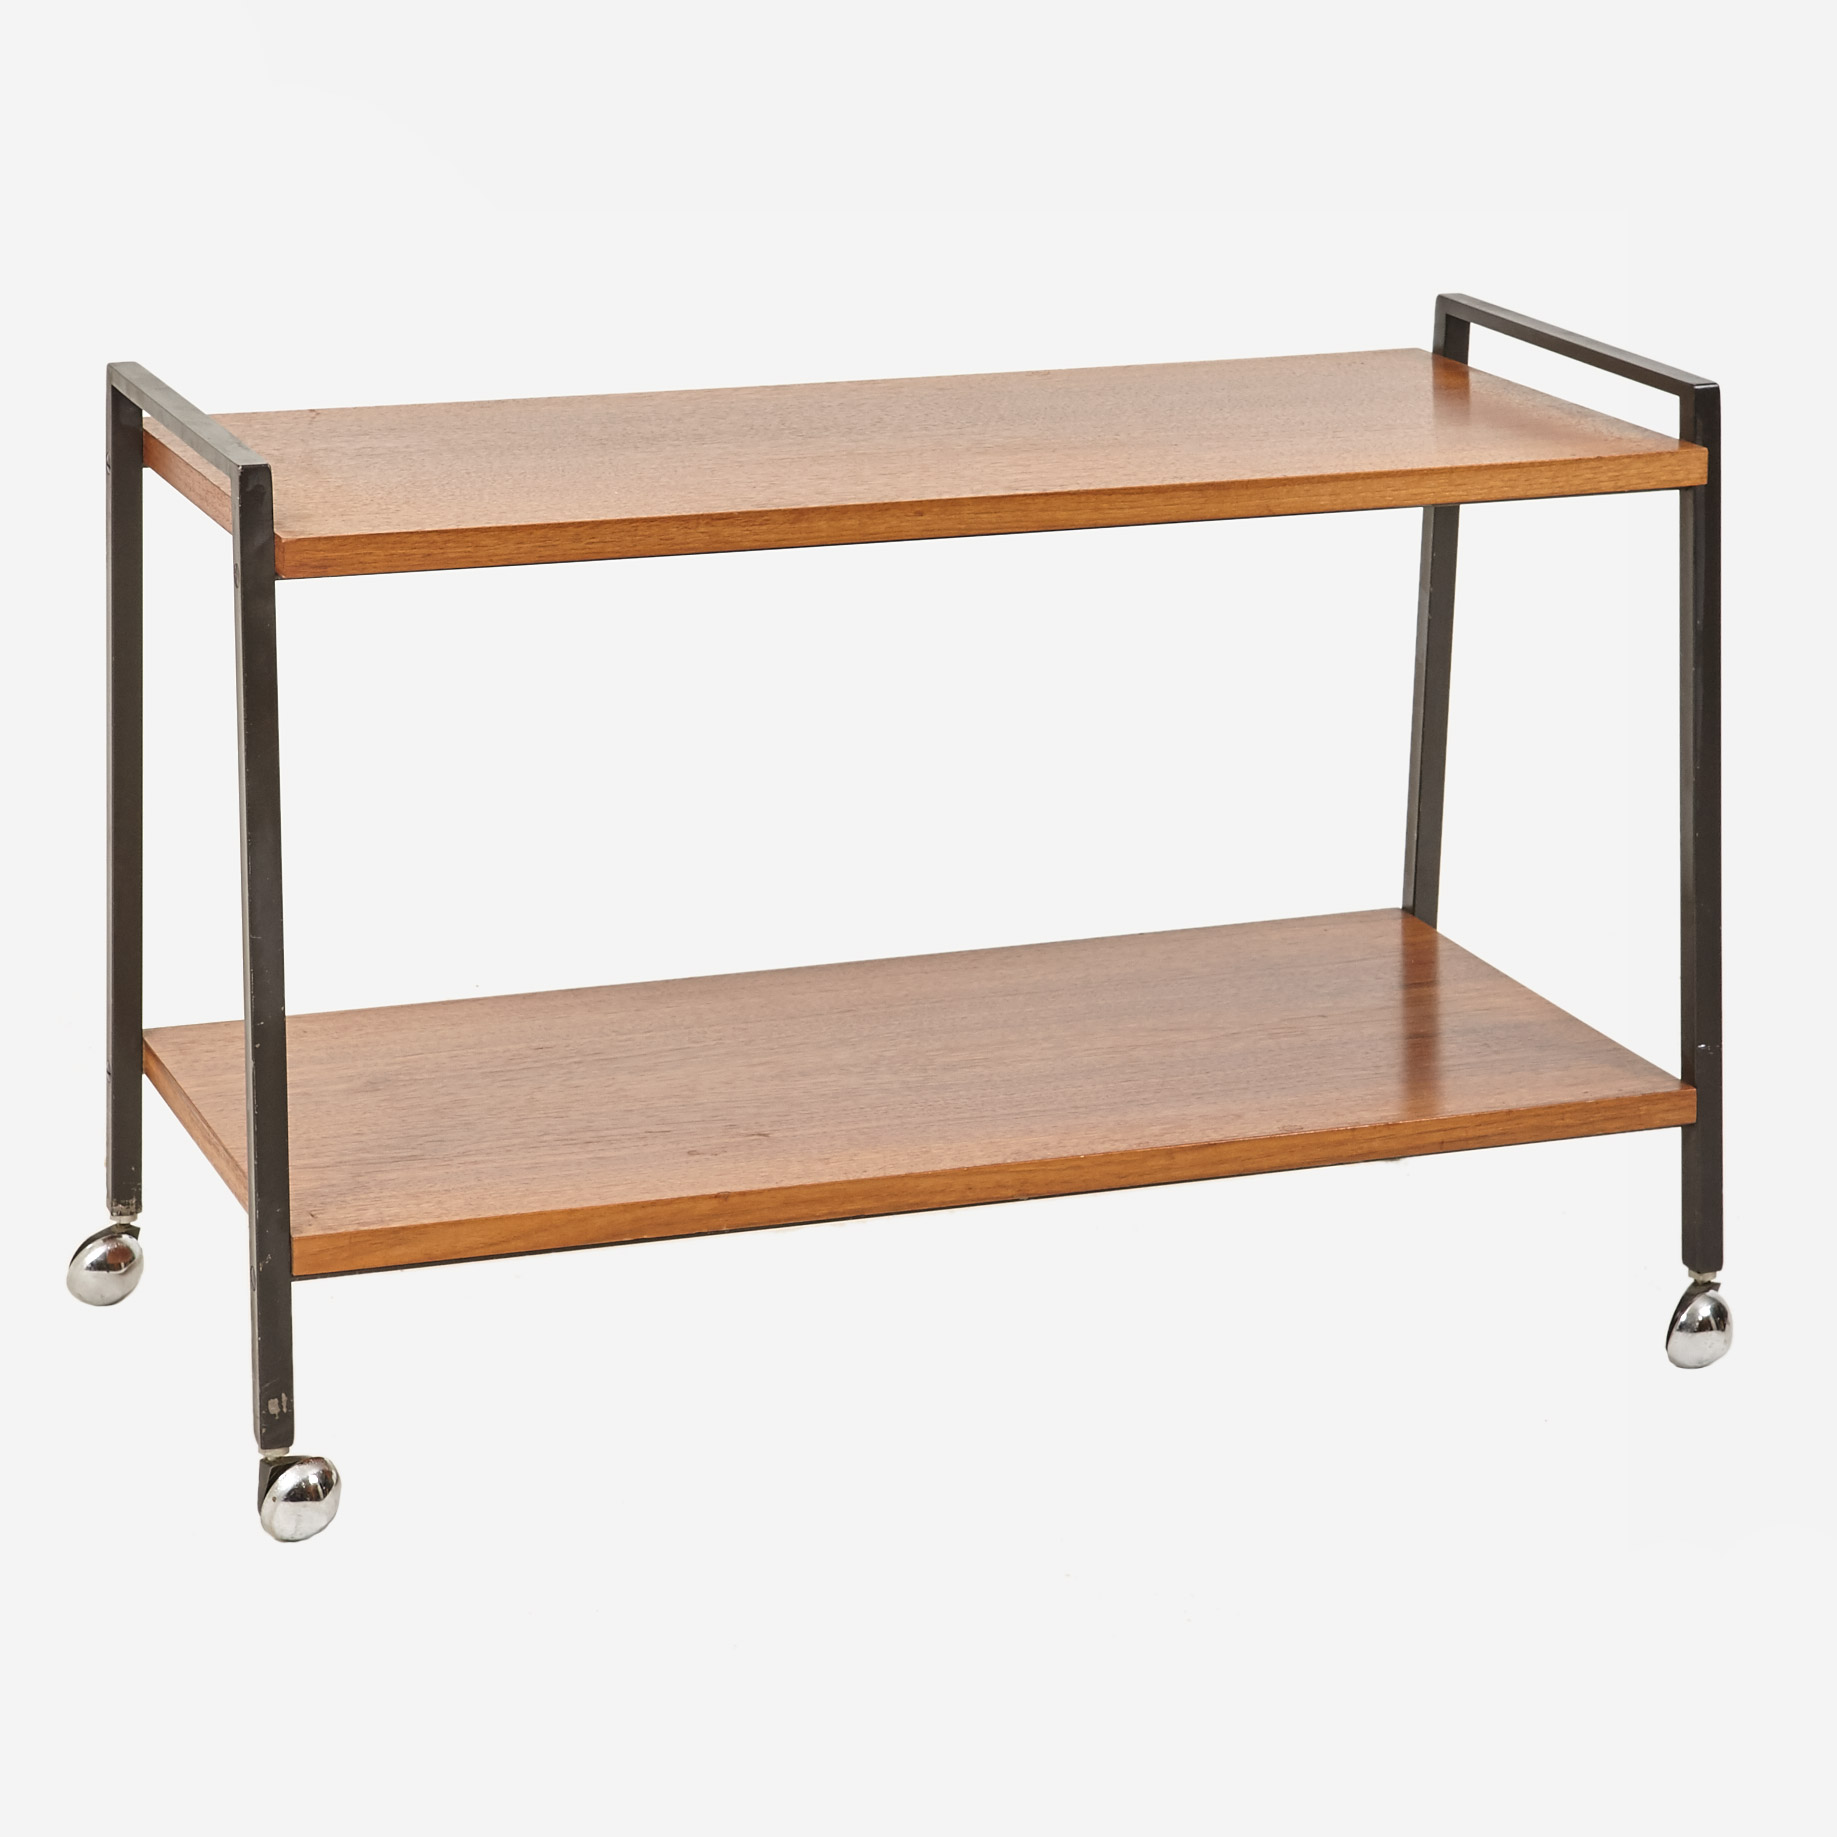 beistelltischli auf r dern m bel z rich vintagem bel. Black Bedroom Furniture Sets. Home Design Ideas